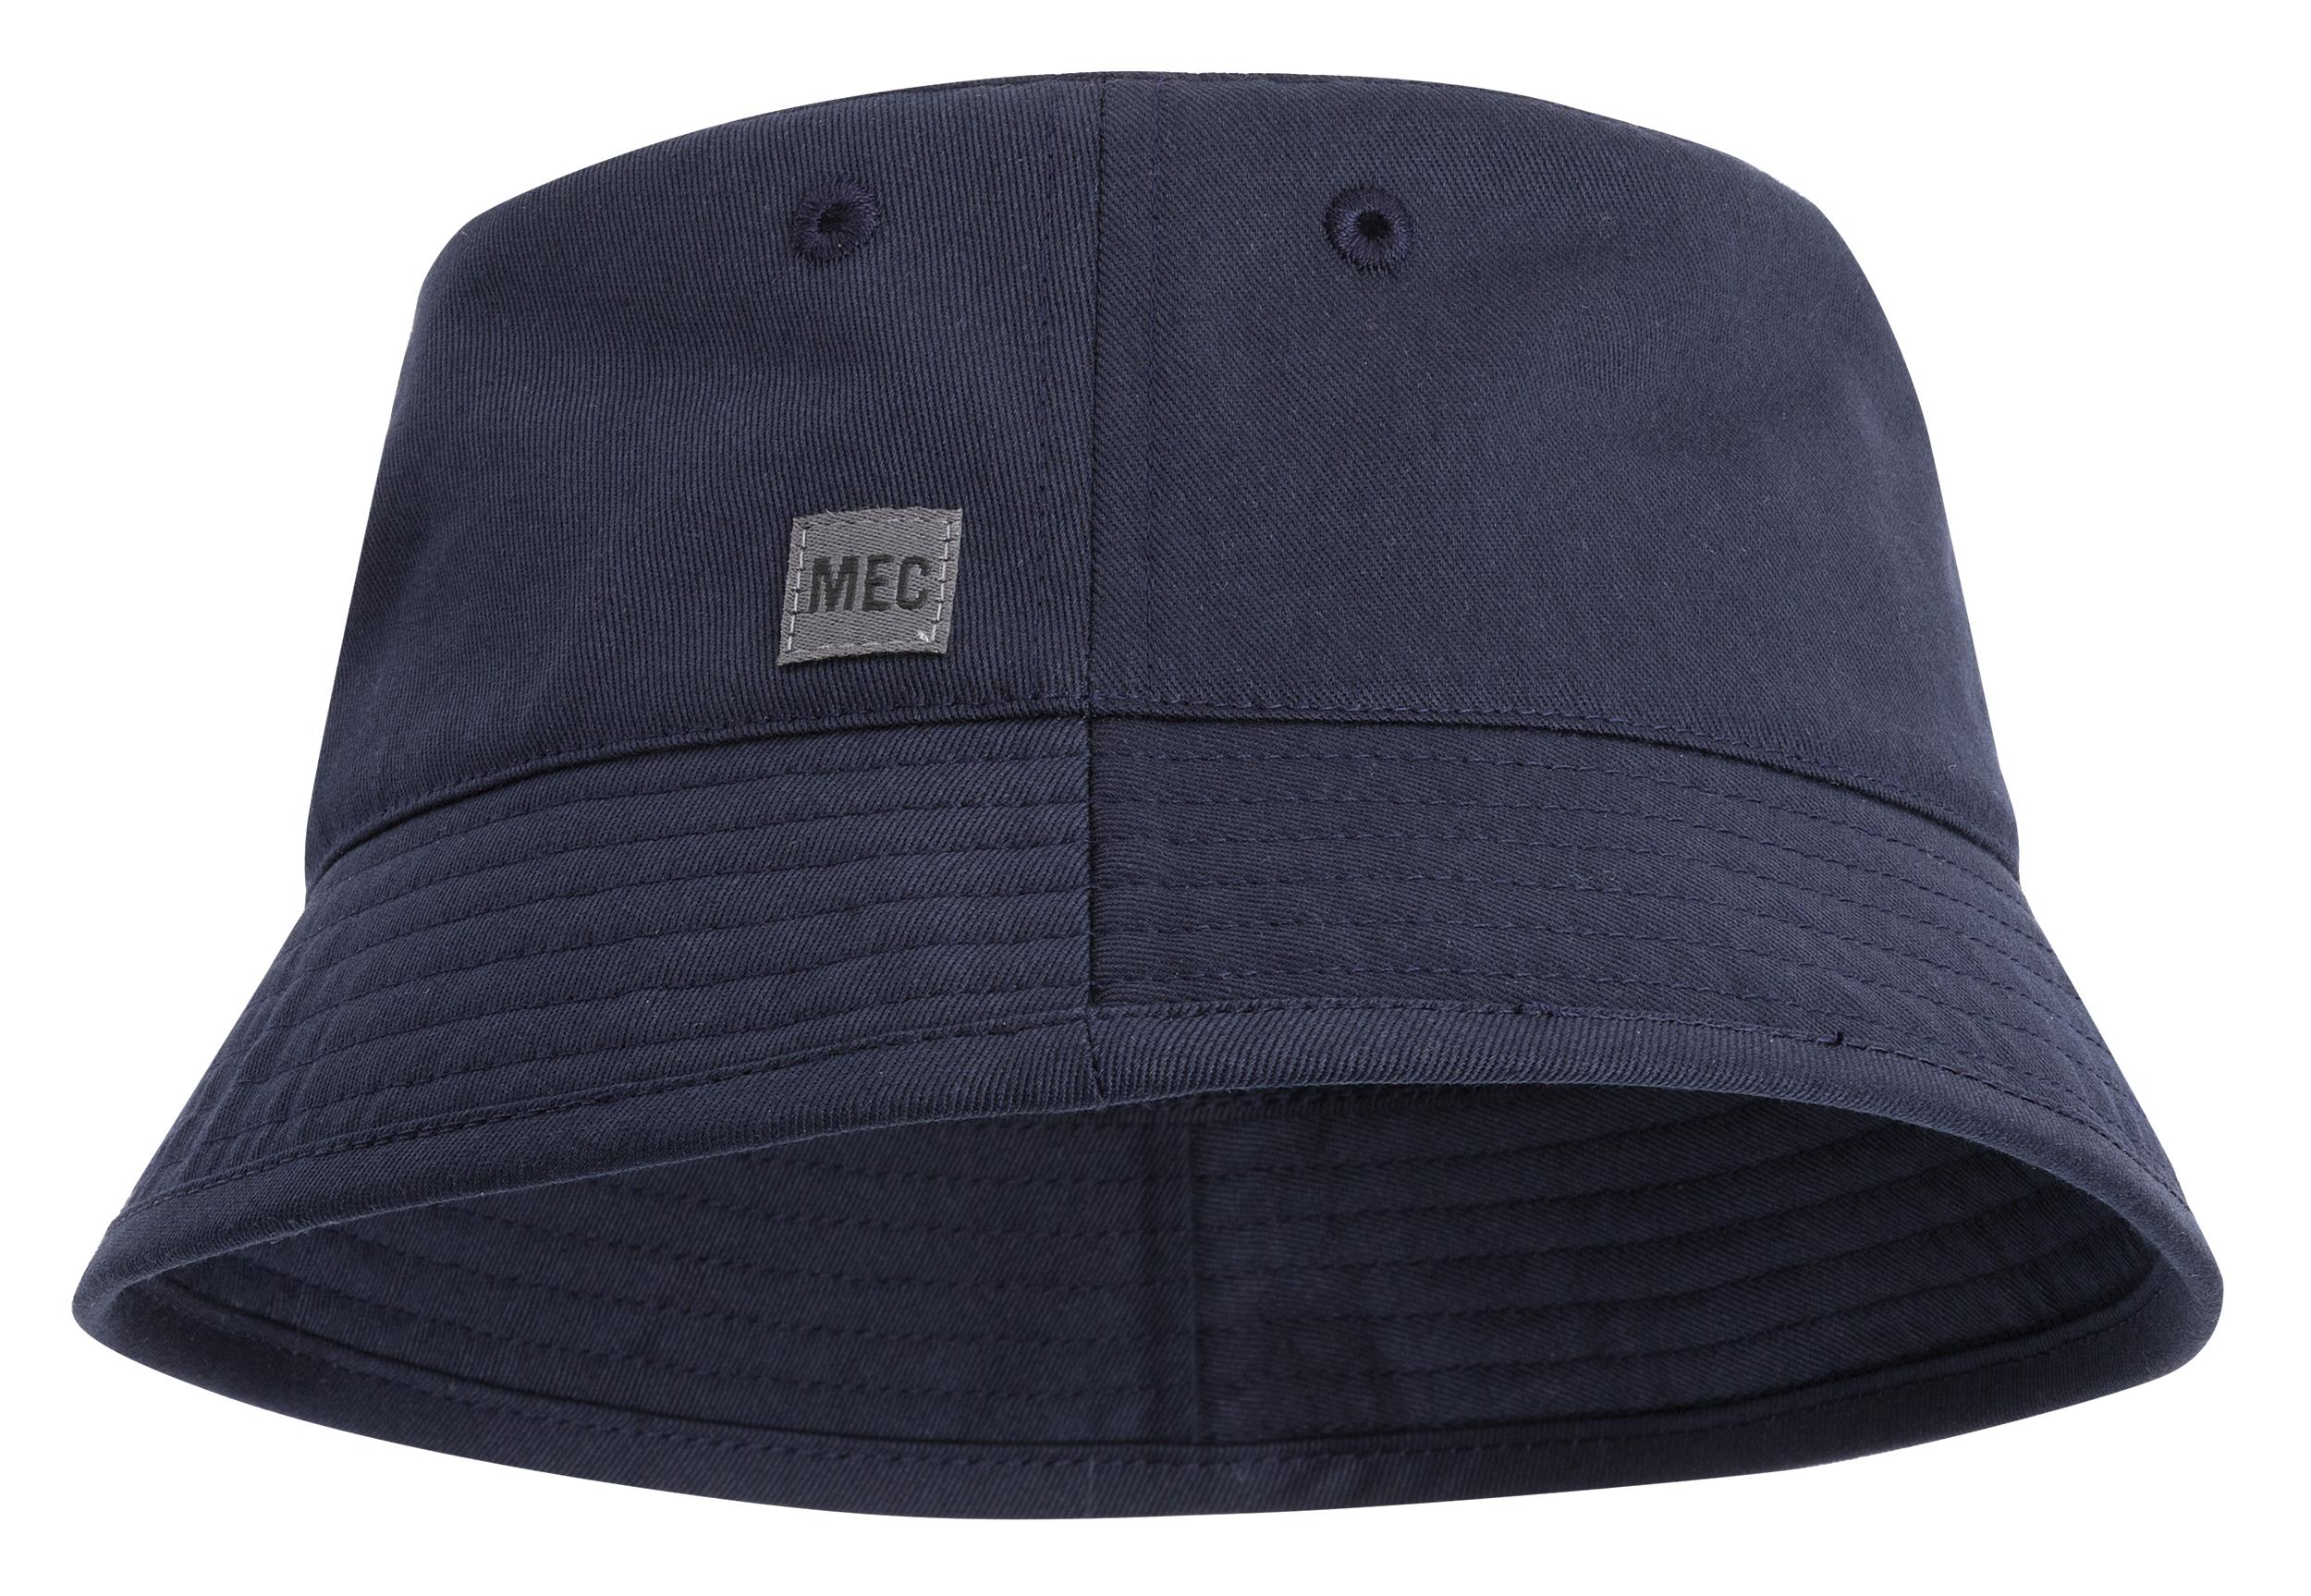 c21d1b81f00 MEC Bucket Hat - Infants to Youths